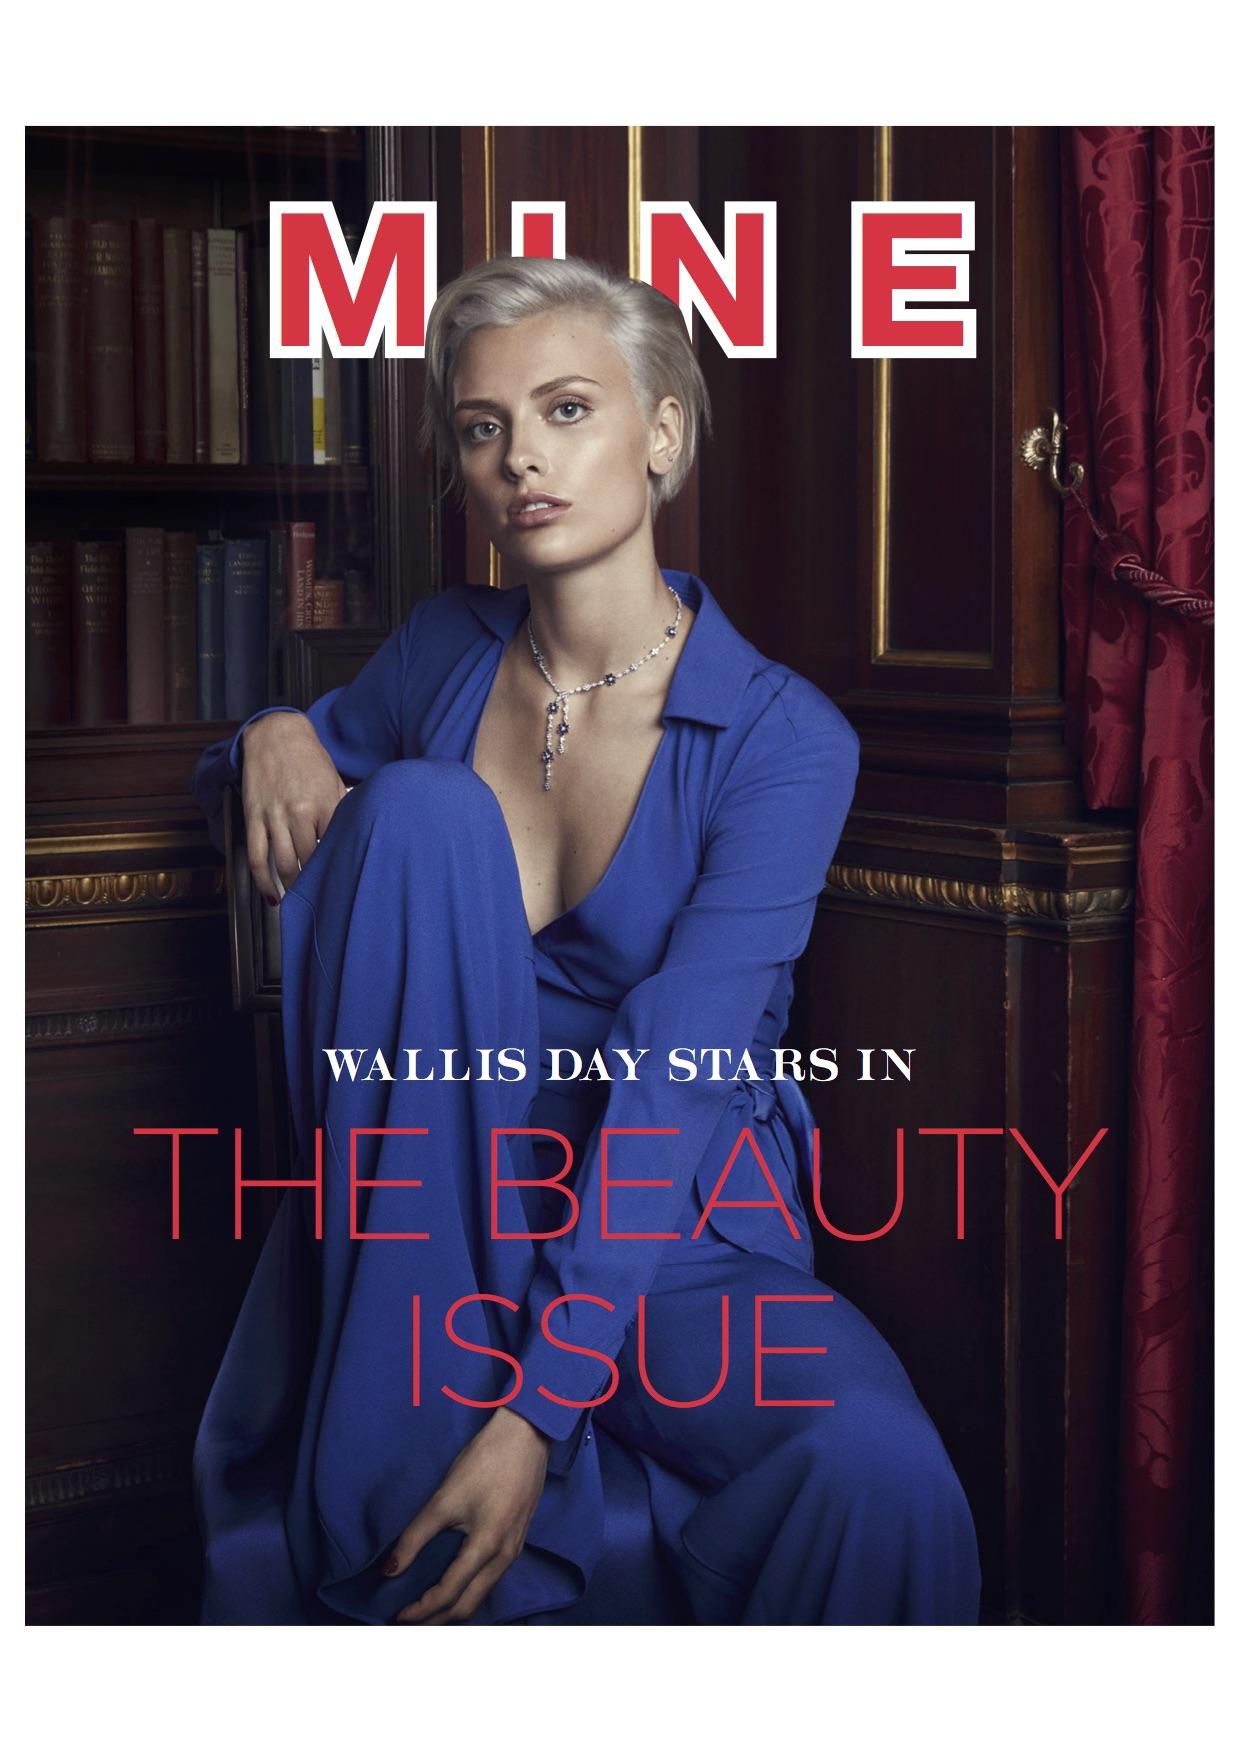 MINE Magazine_Wallis Day_Cover.jpg